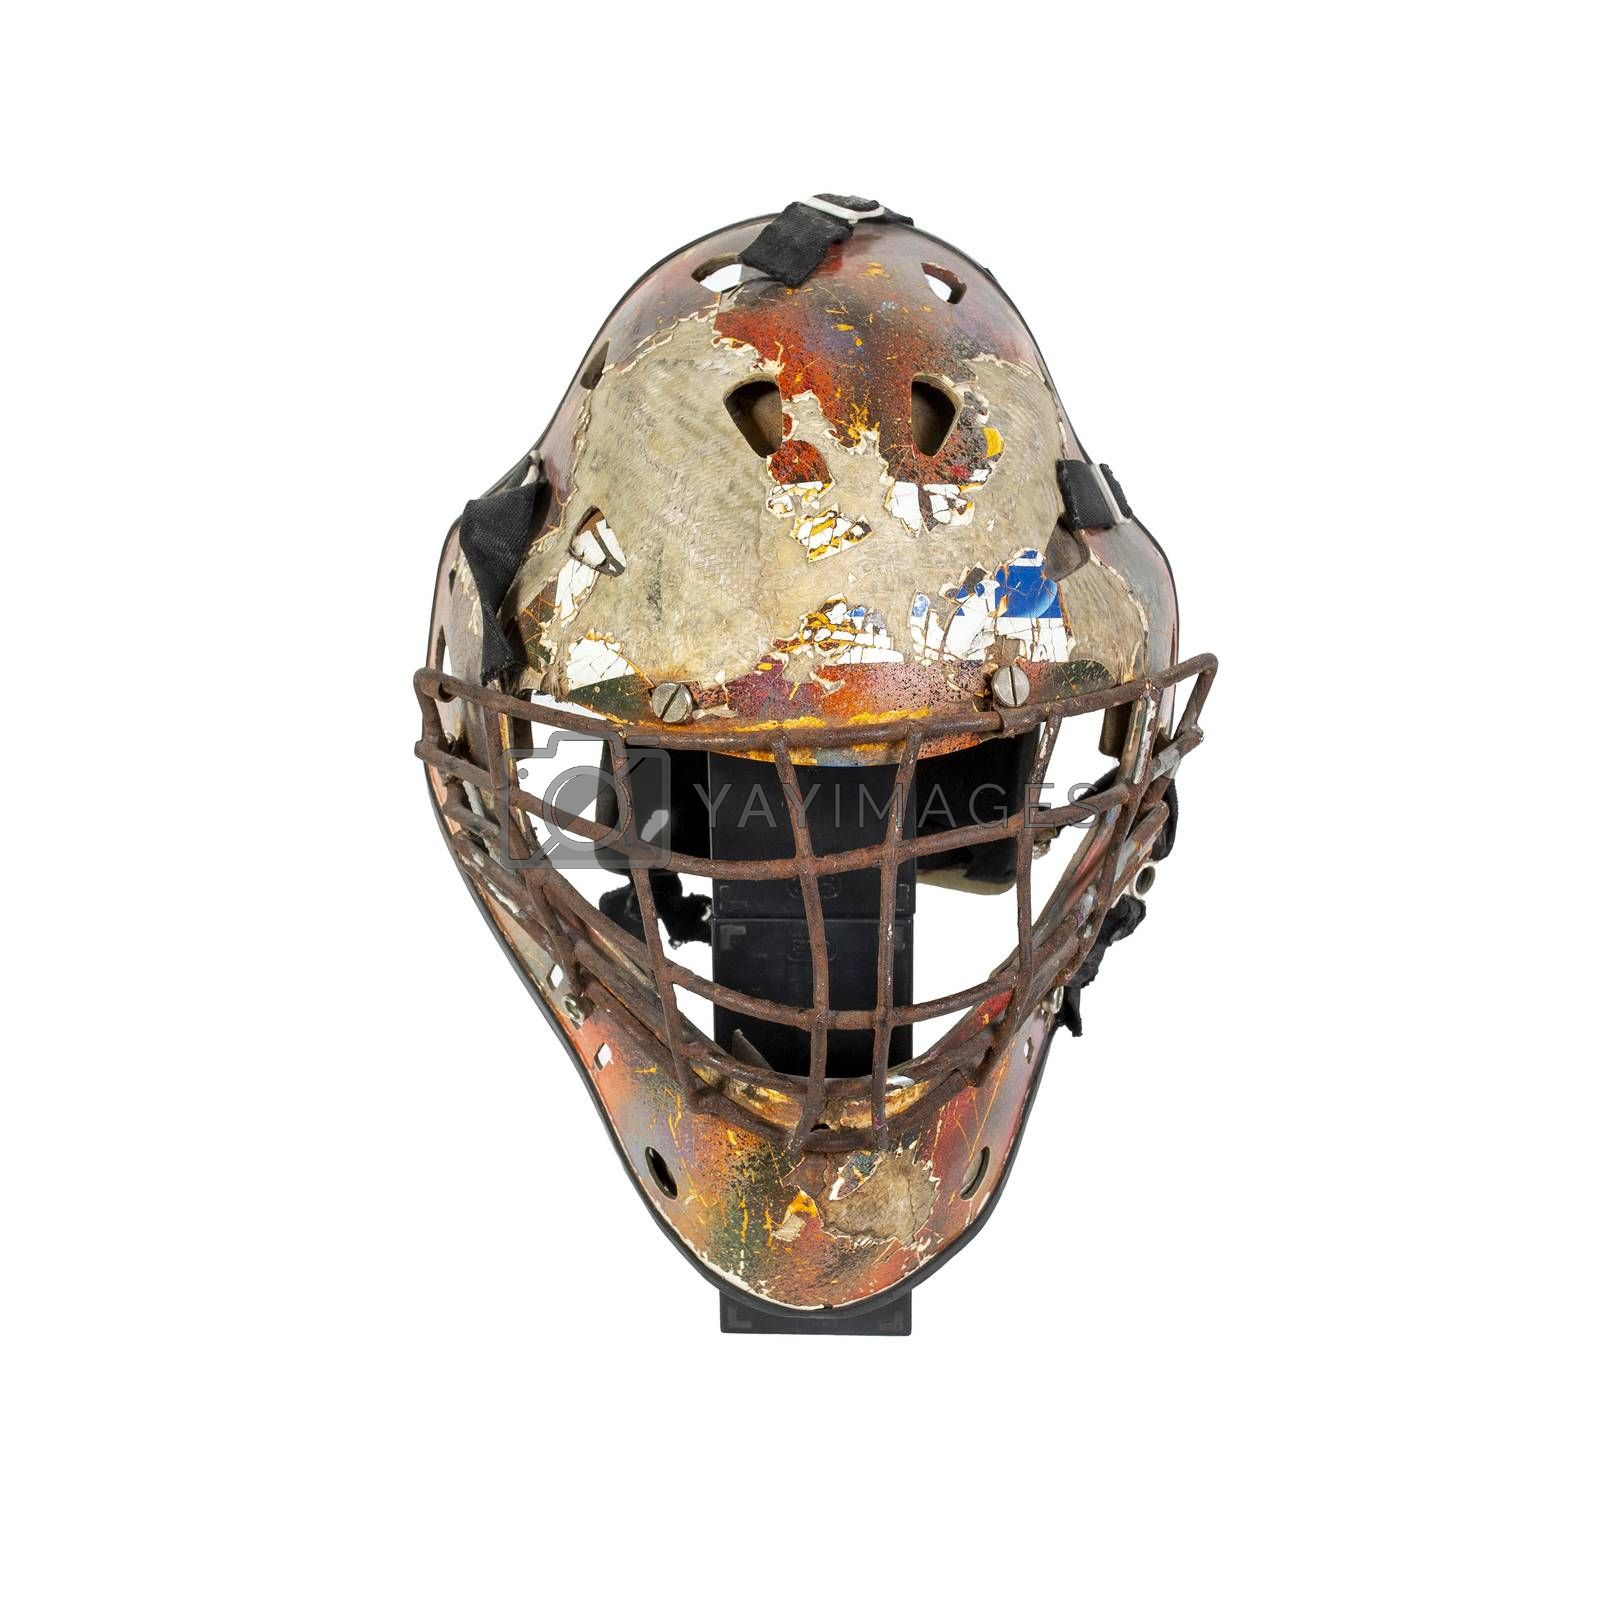 Old hockey mask for goalkeeper protection isolated on white background